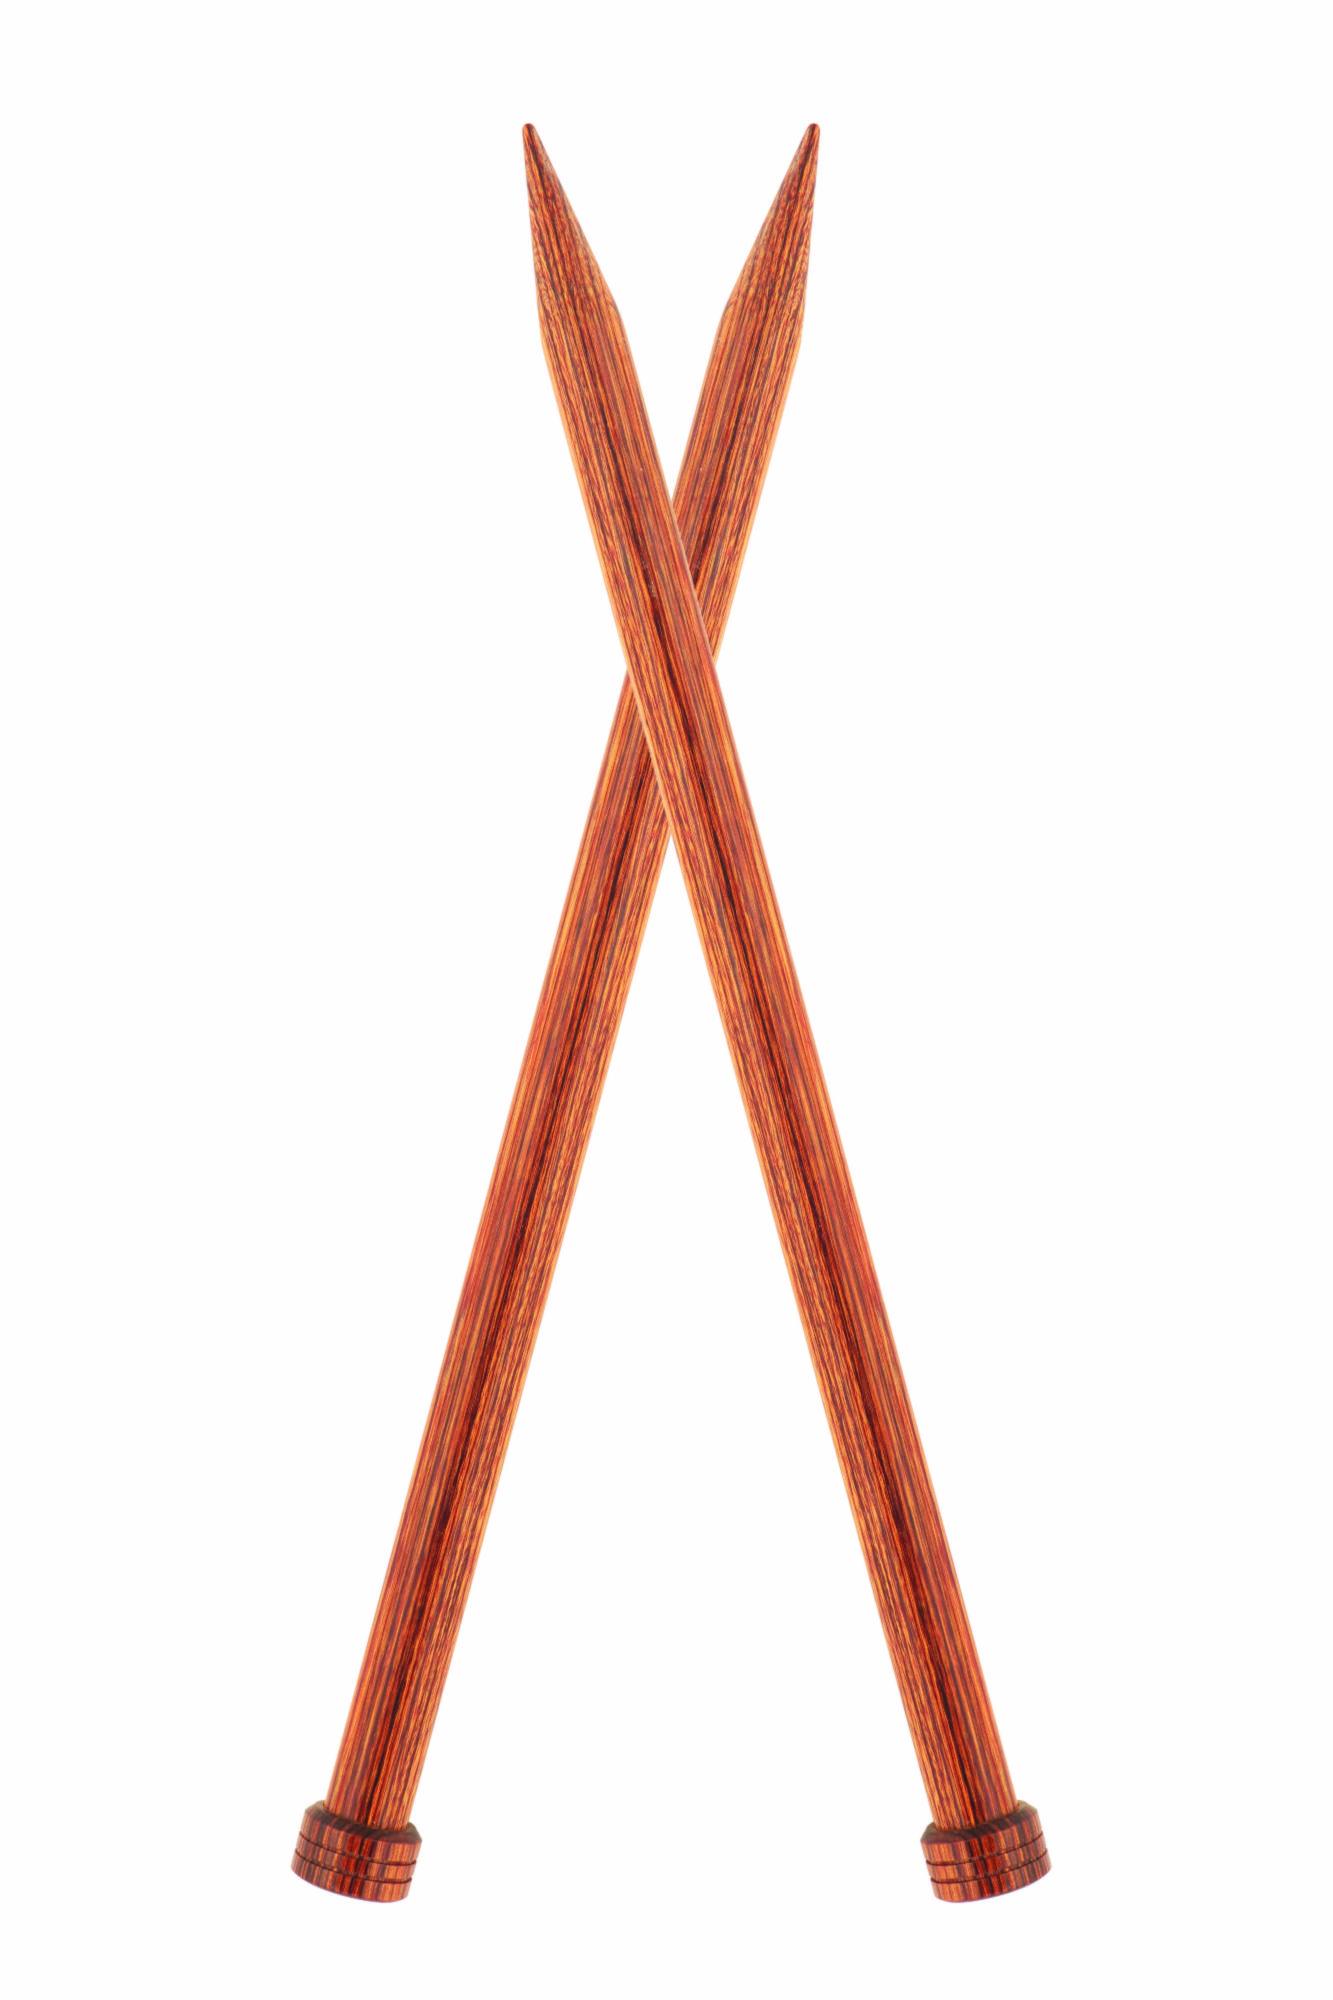 31166 Спицы прямые 4.50 мм - 30 см Ginger KnitPro